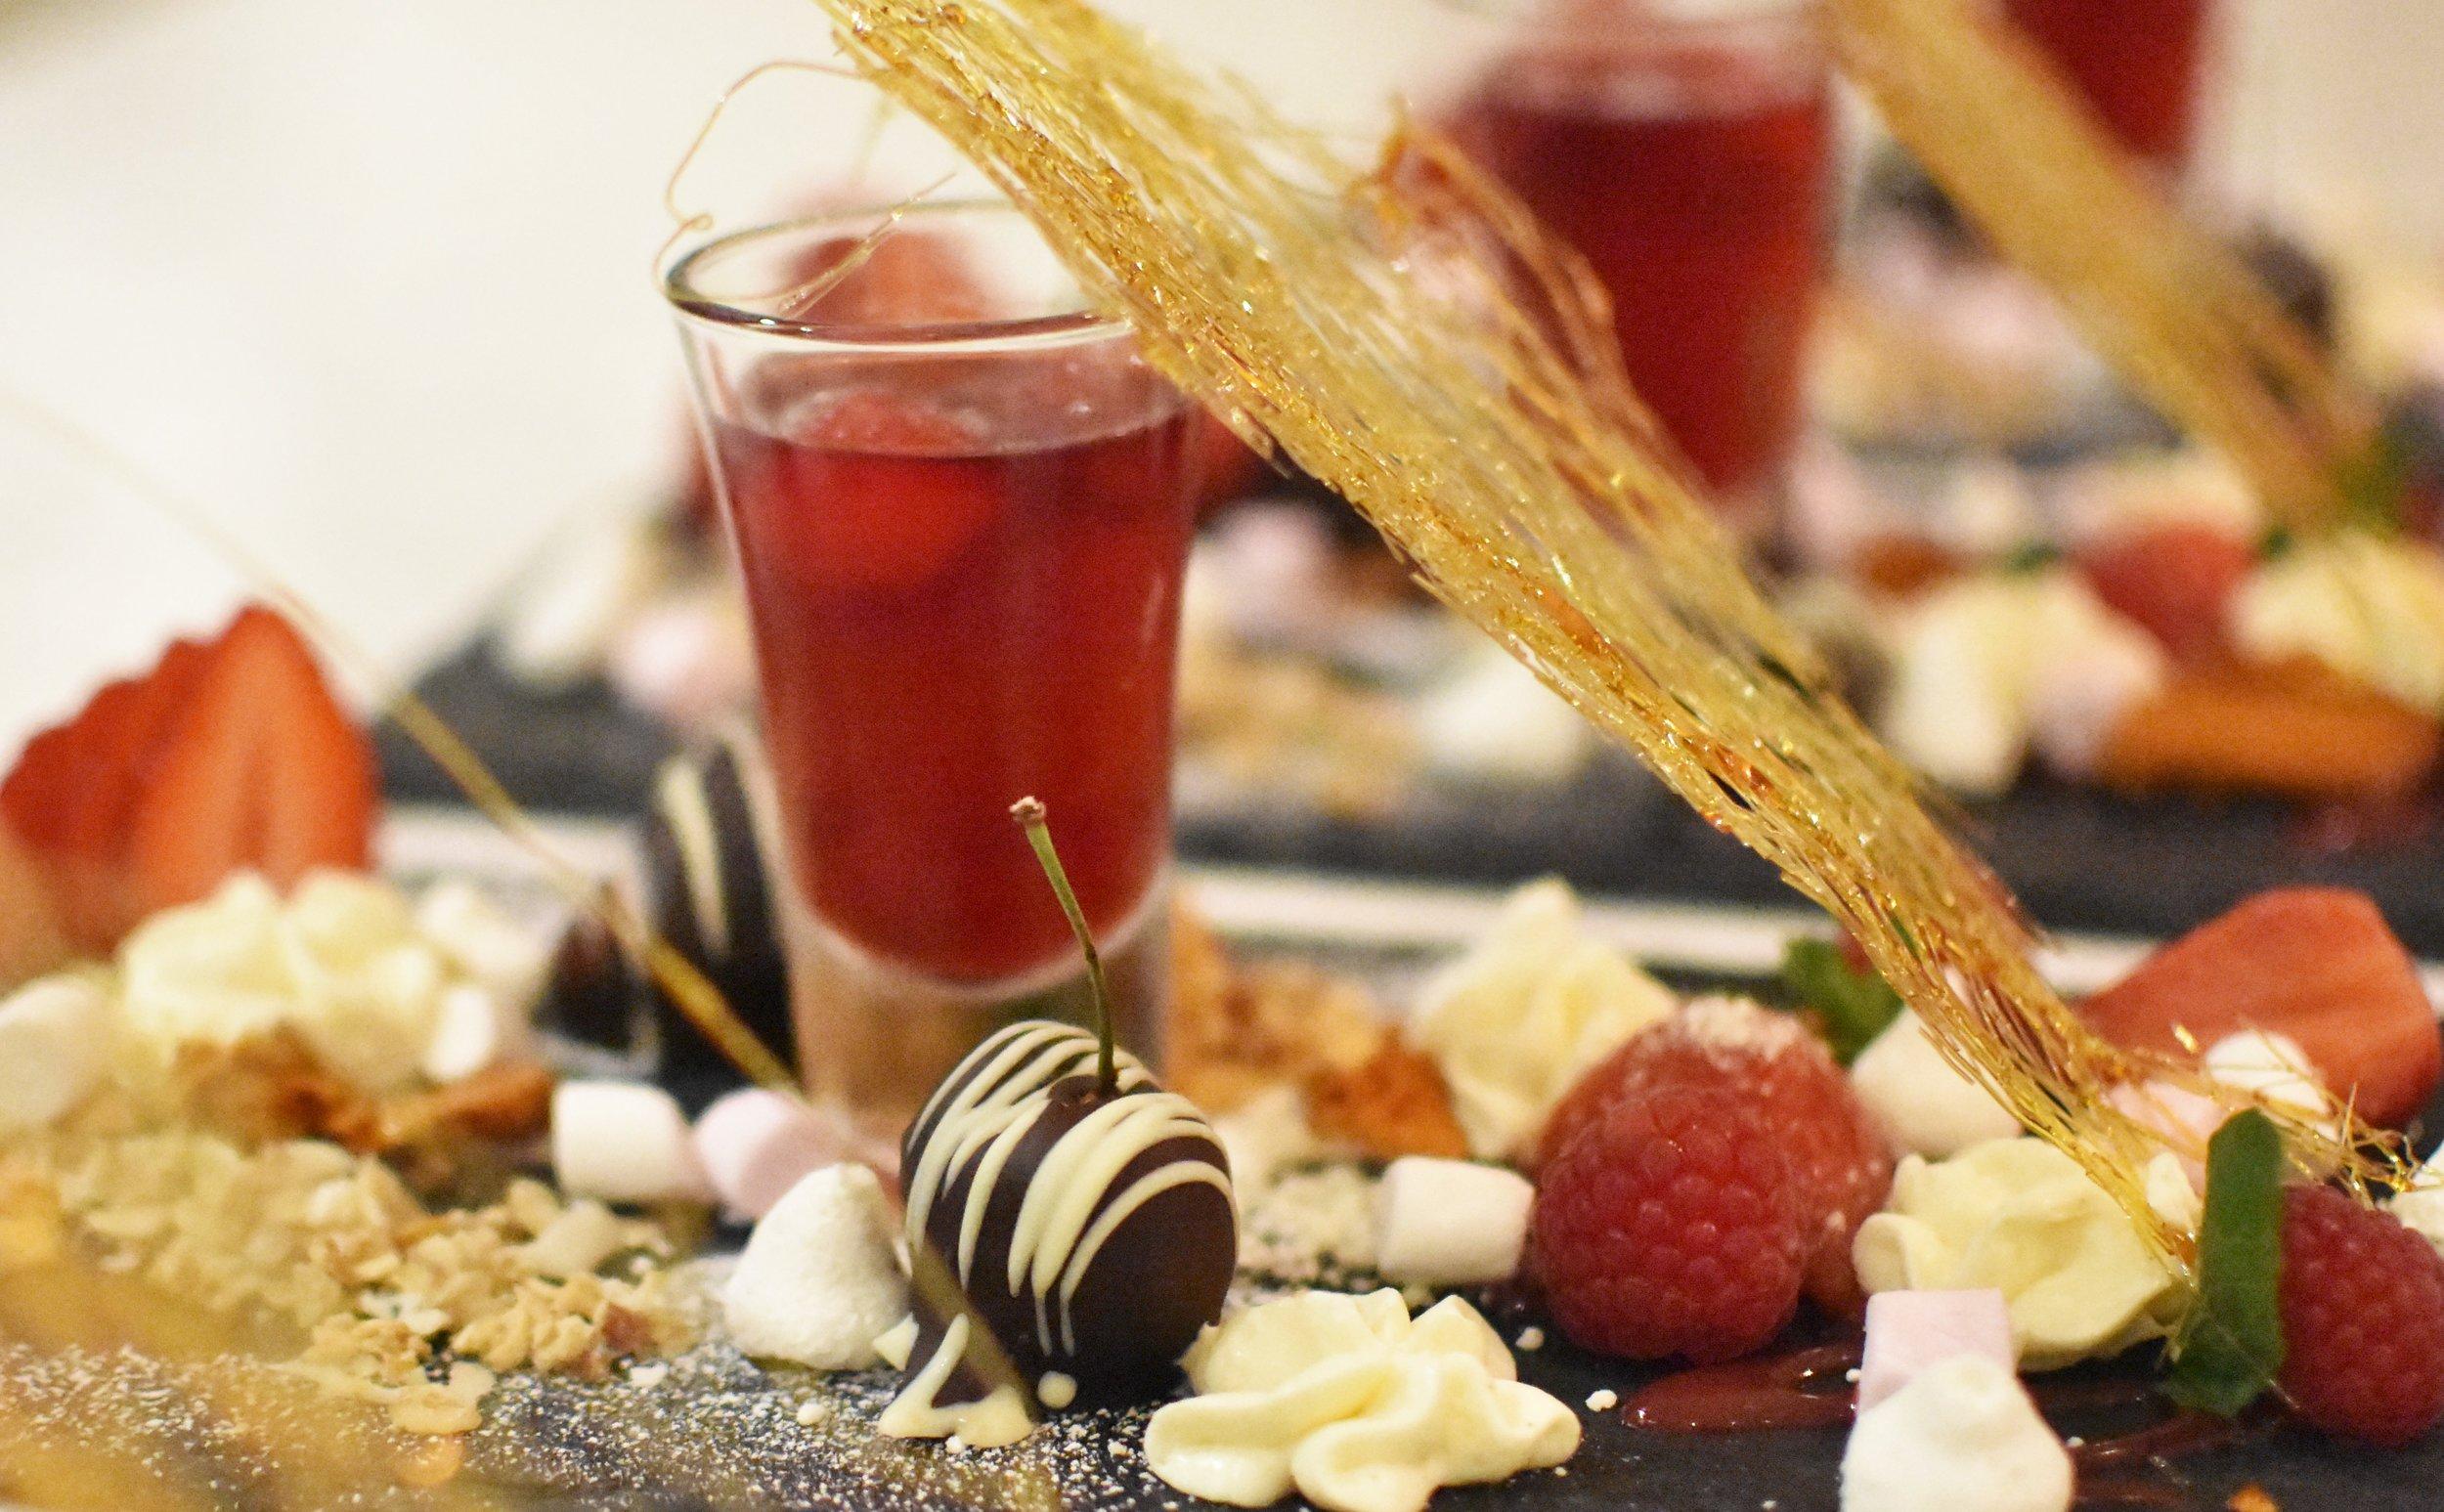 ChefGary trio of desserts